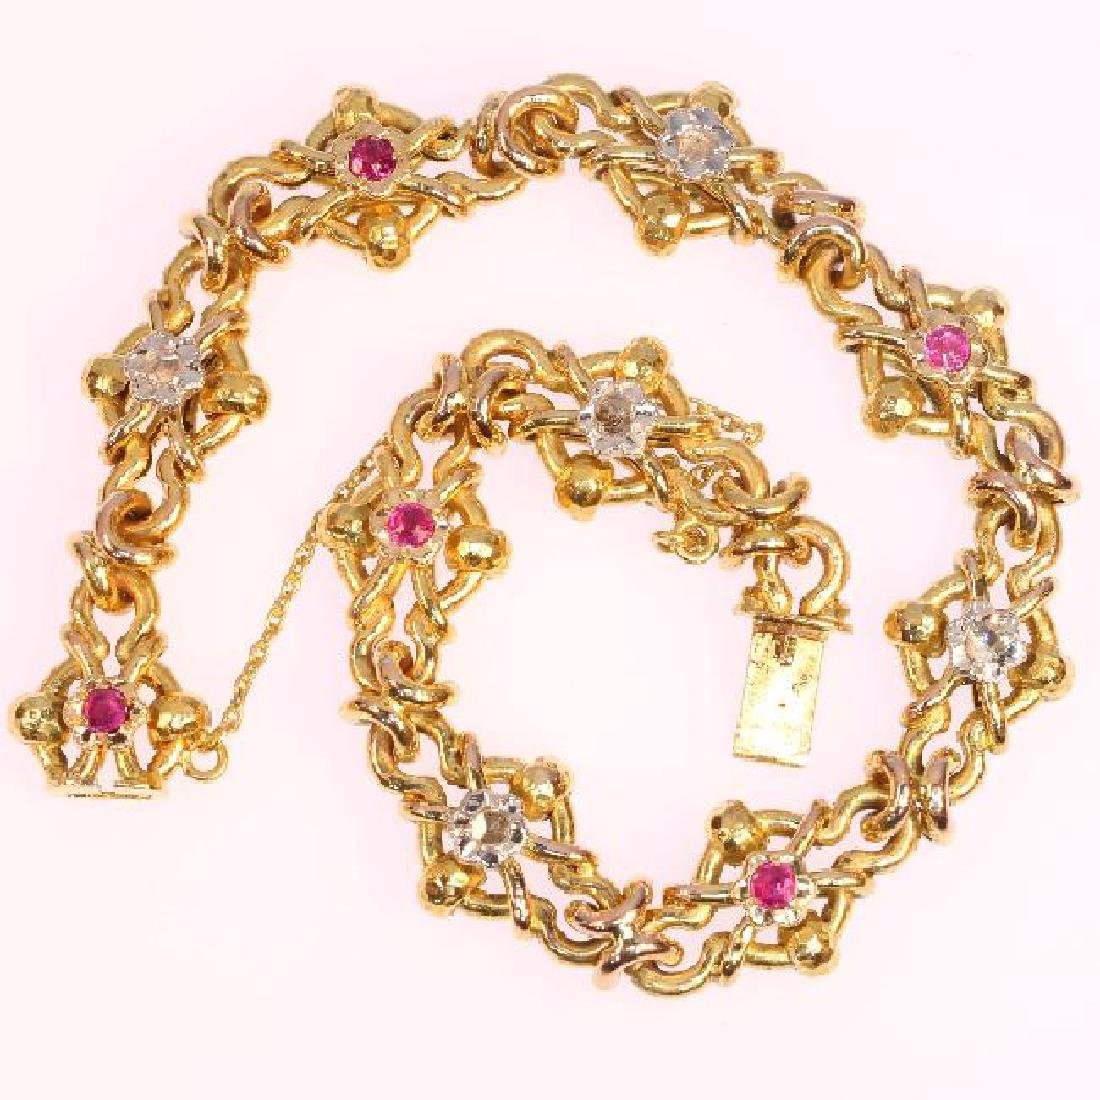 Antique Victorian 18K Yellow Gold Diamond Bracelet